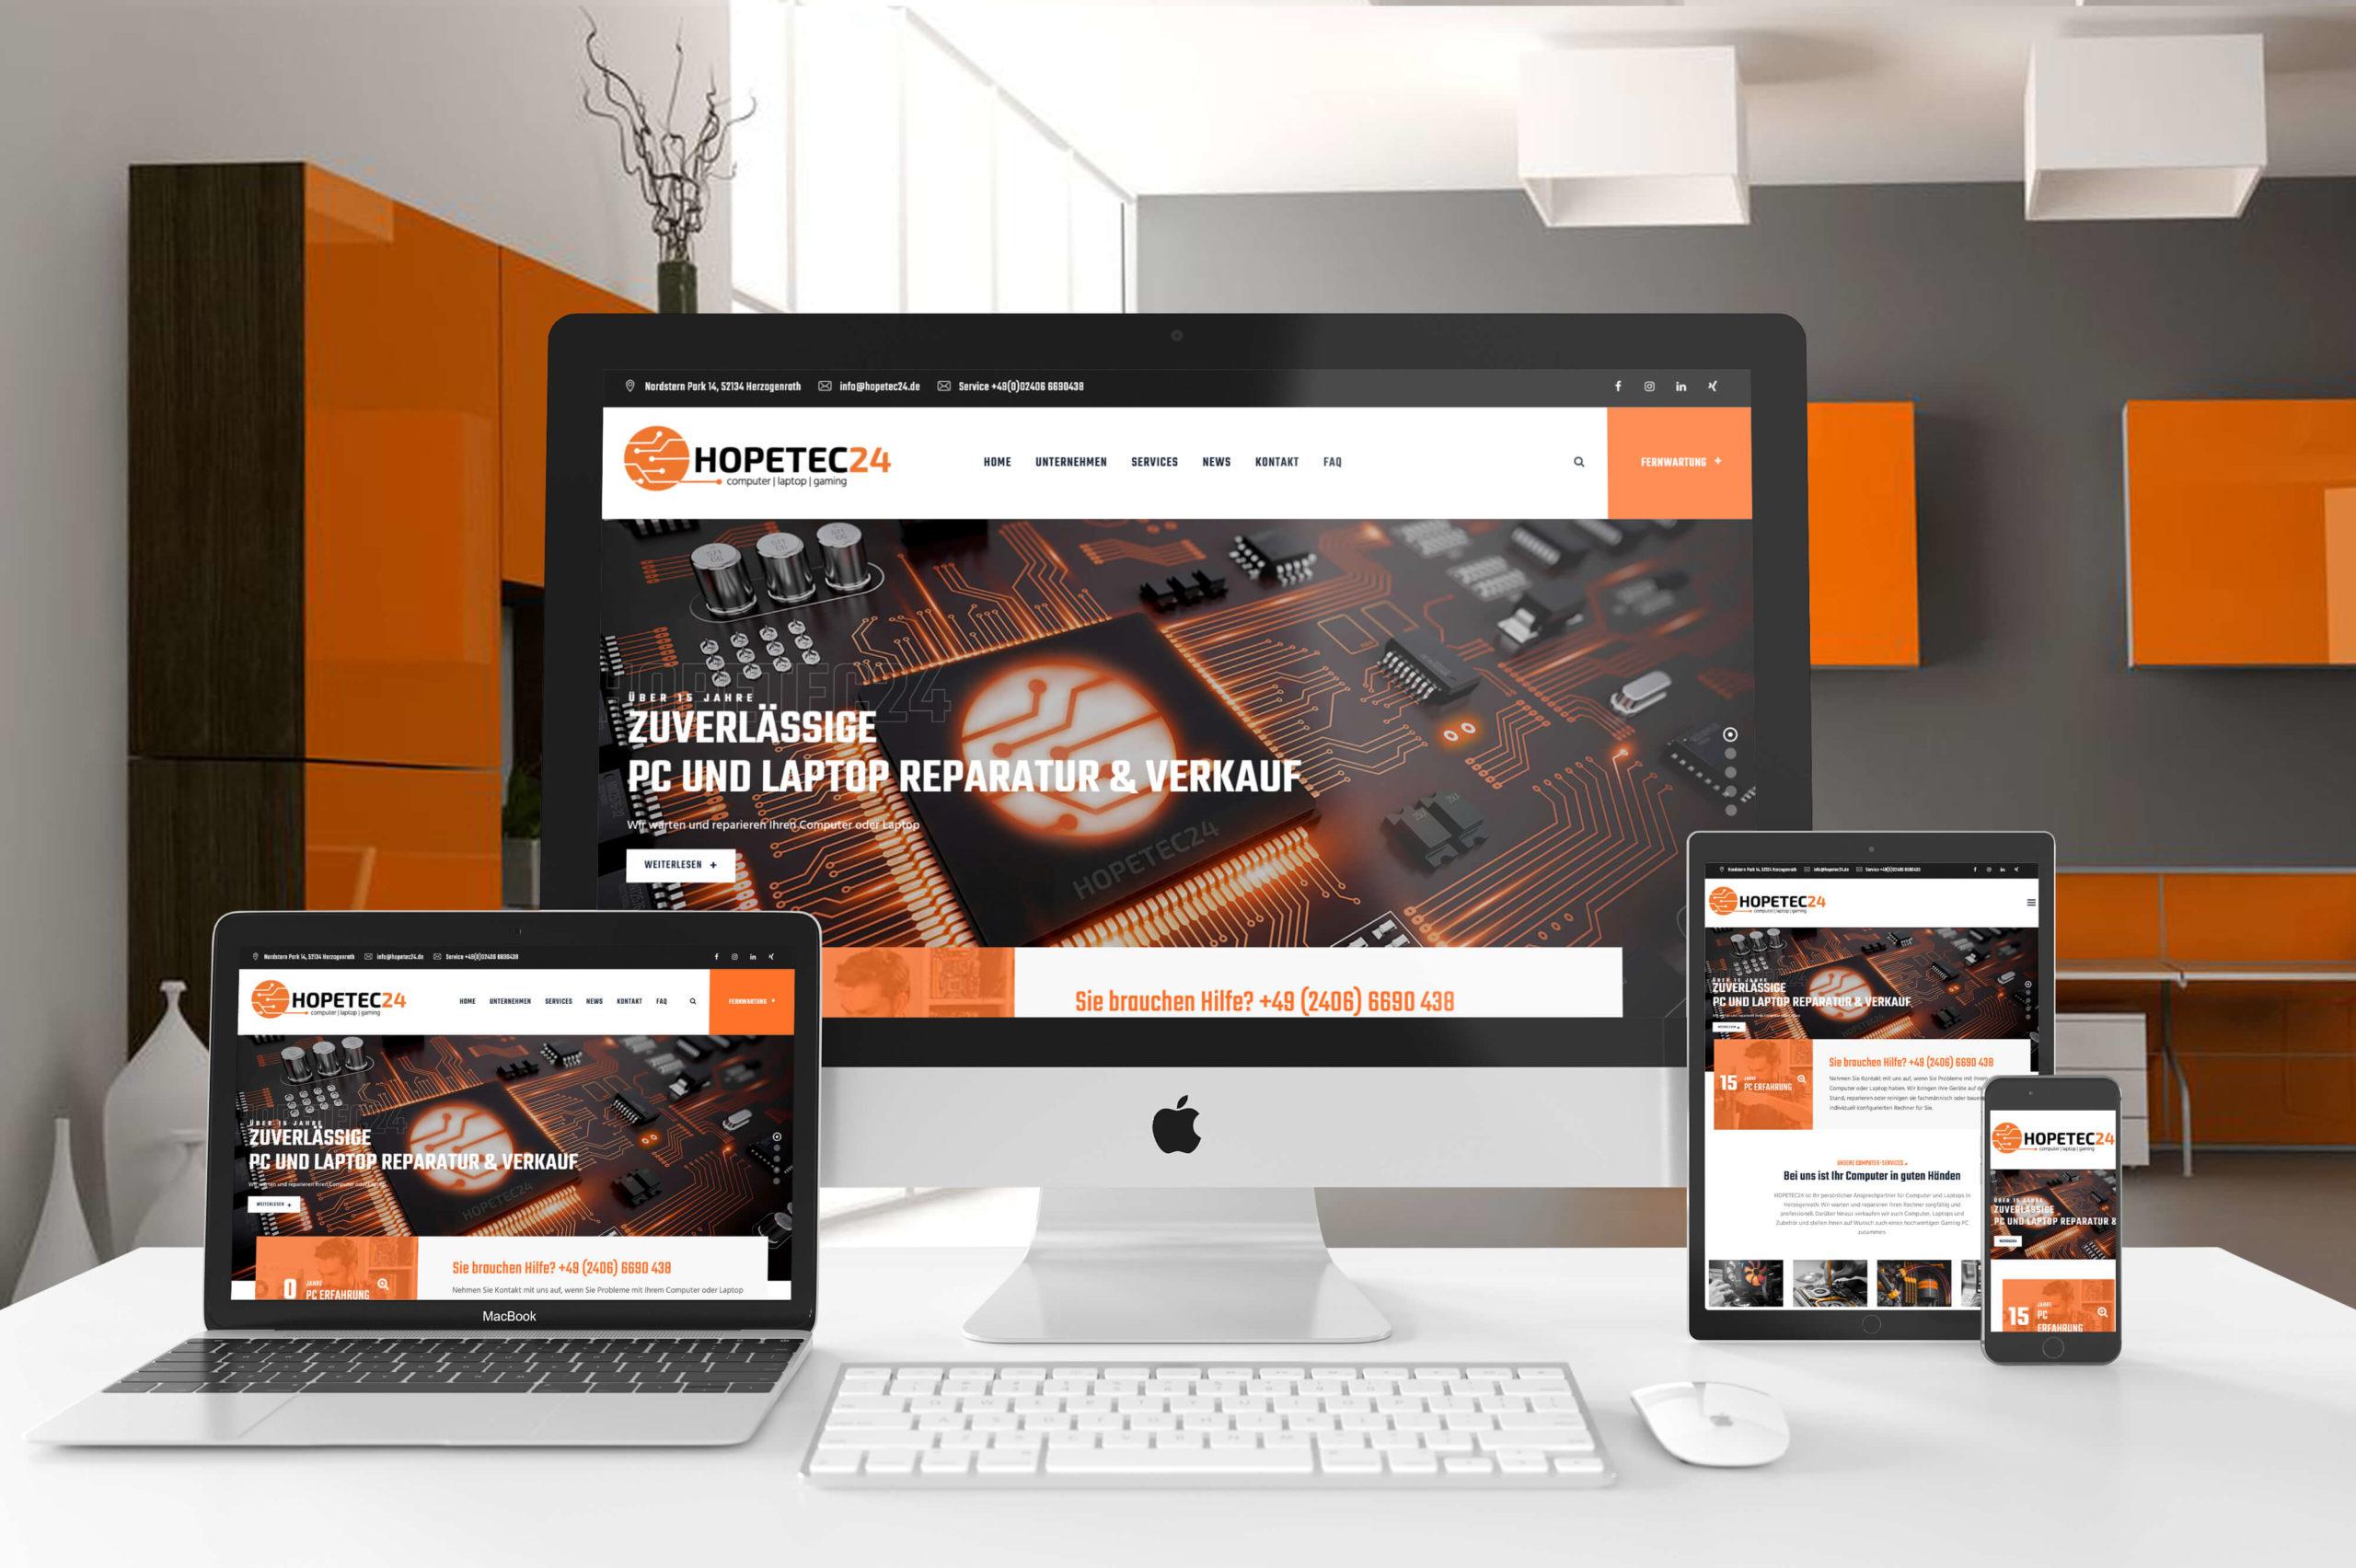 hopetec24 Website